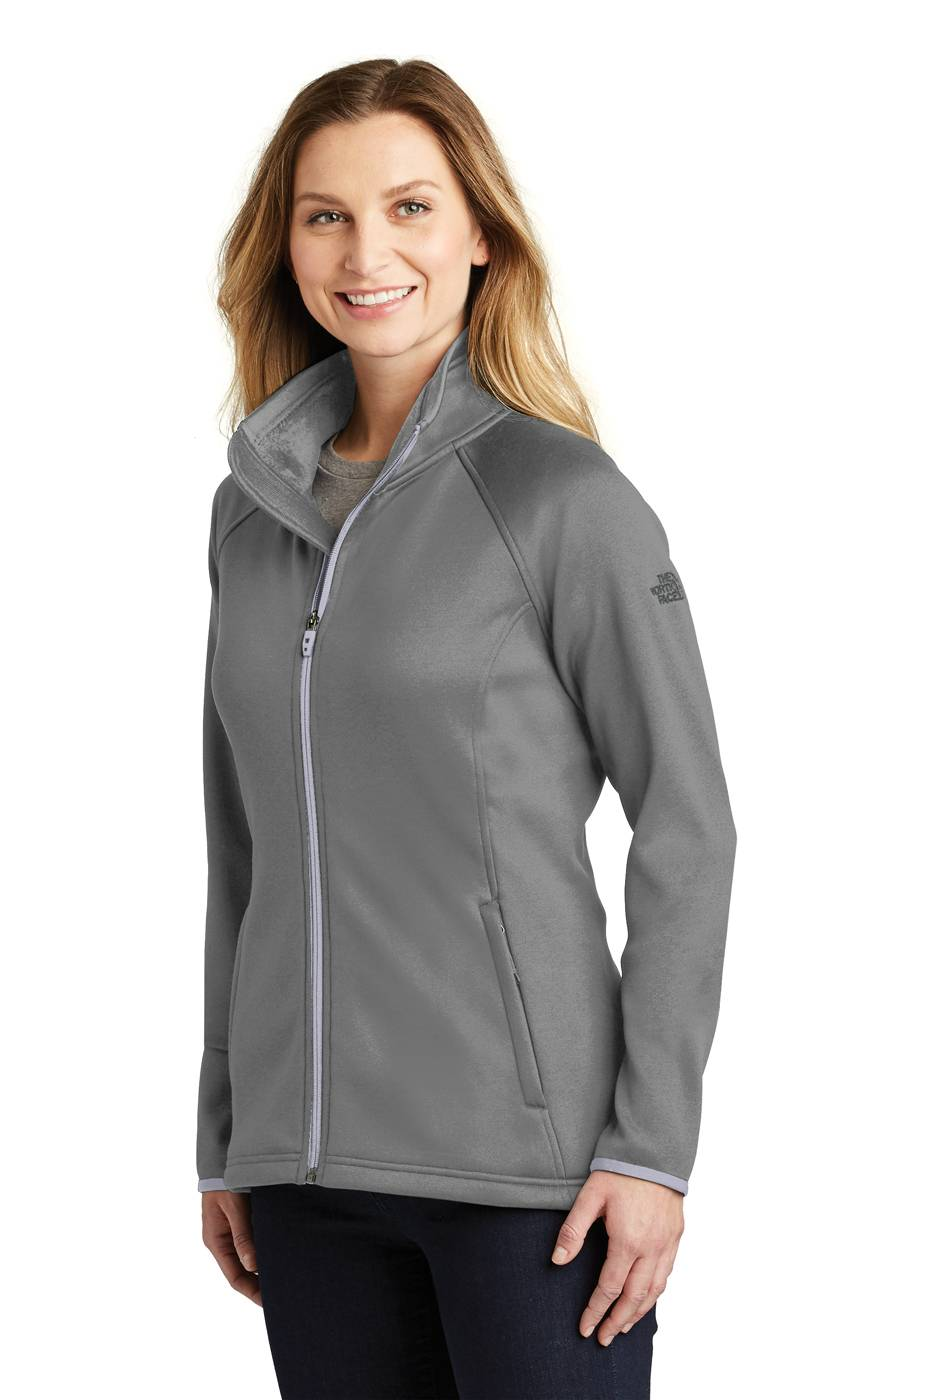 346e82ba335d  84.95. The North Face Women s Canyon Flats Custom Fleece Jacket